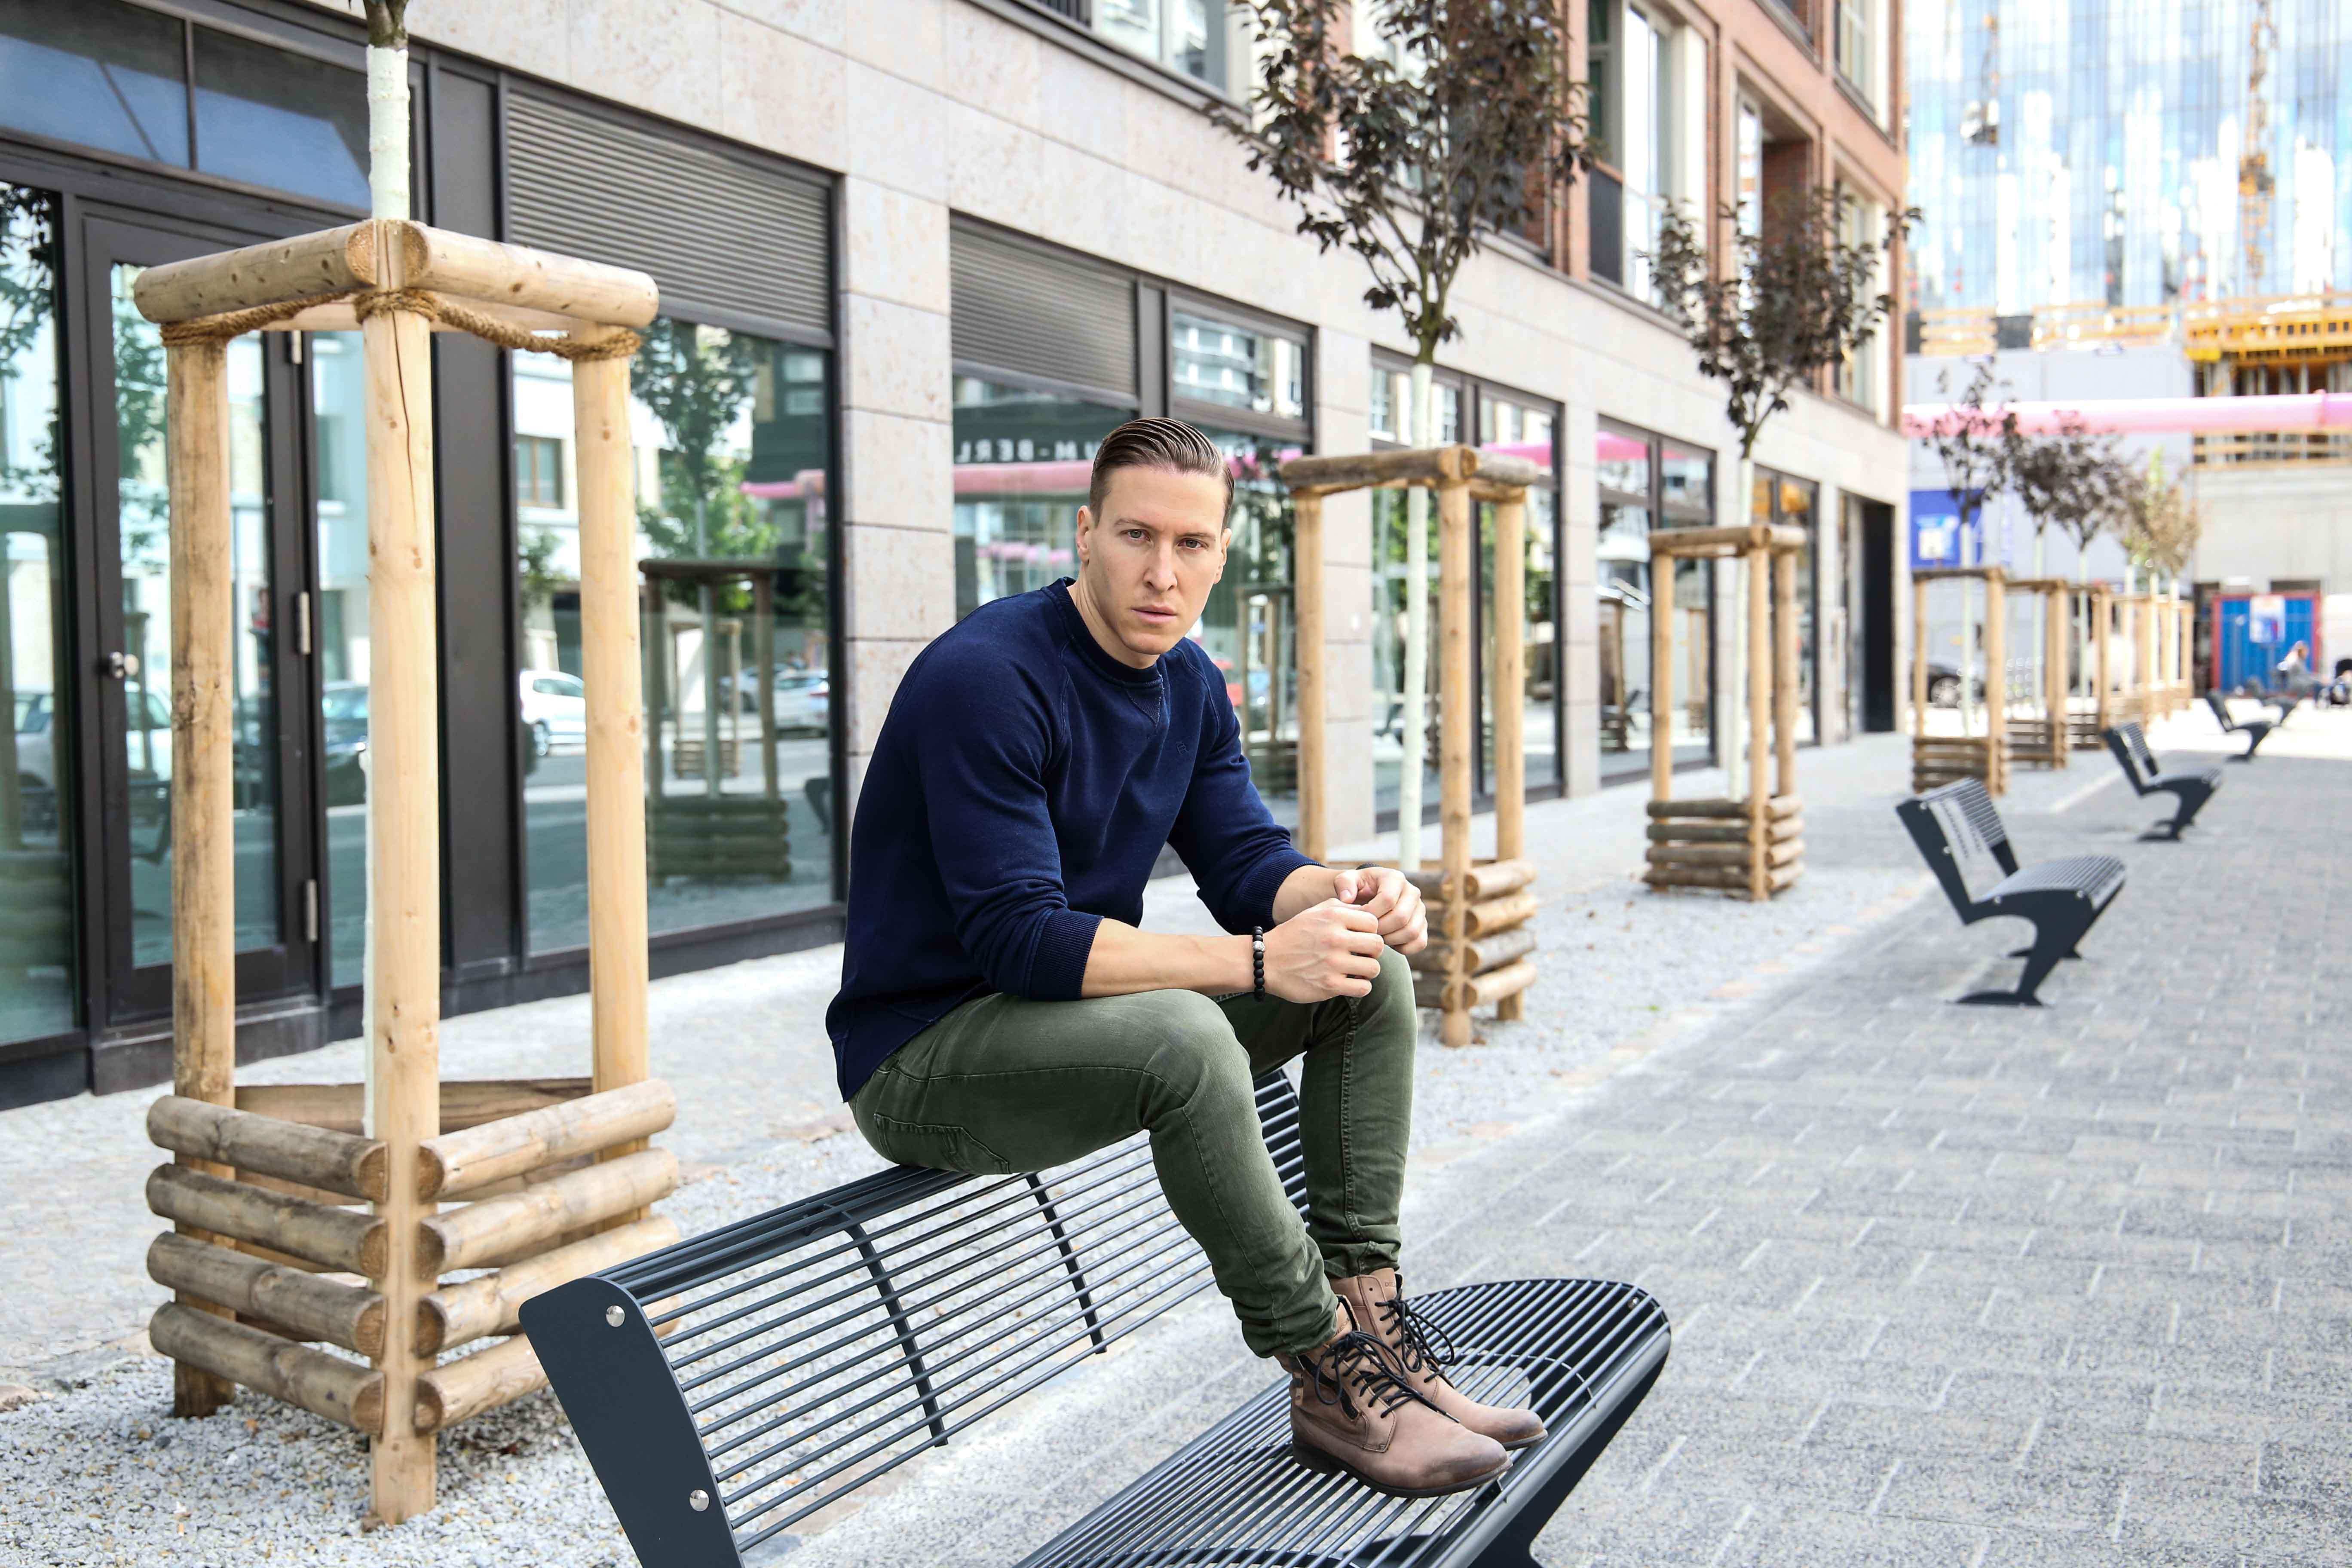 herbst-look-sweatshirt-indigo-blau-washed-skinny-jeans-grün-modeblog-männerblog-berlin_0129